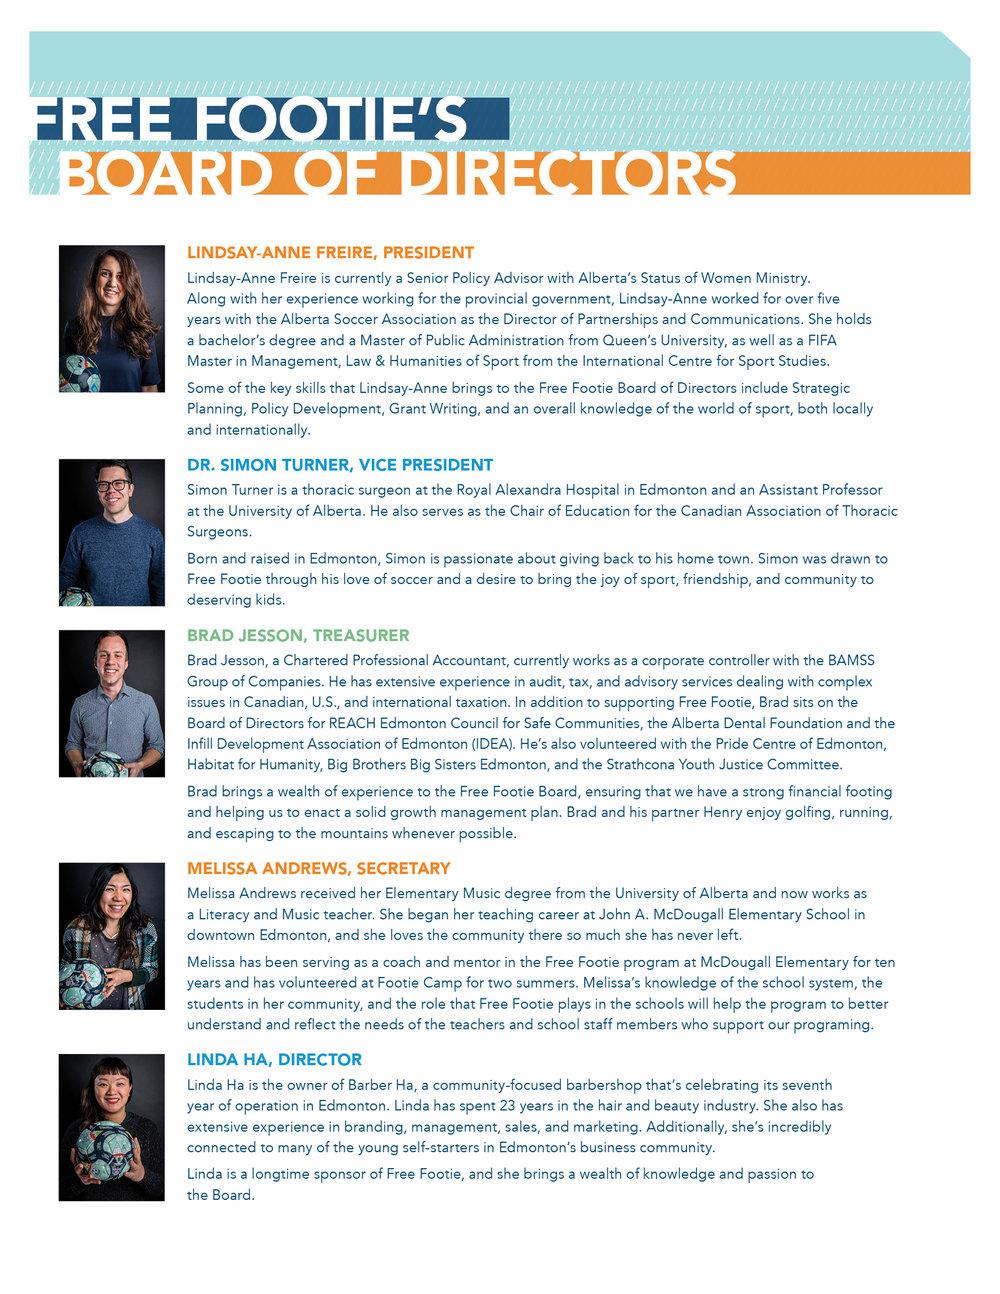 Free Footie Board of Directors_V3.jpg